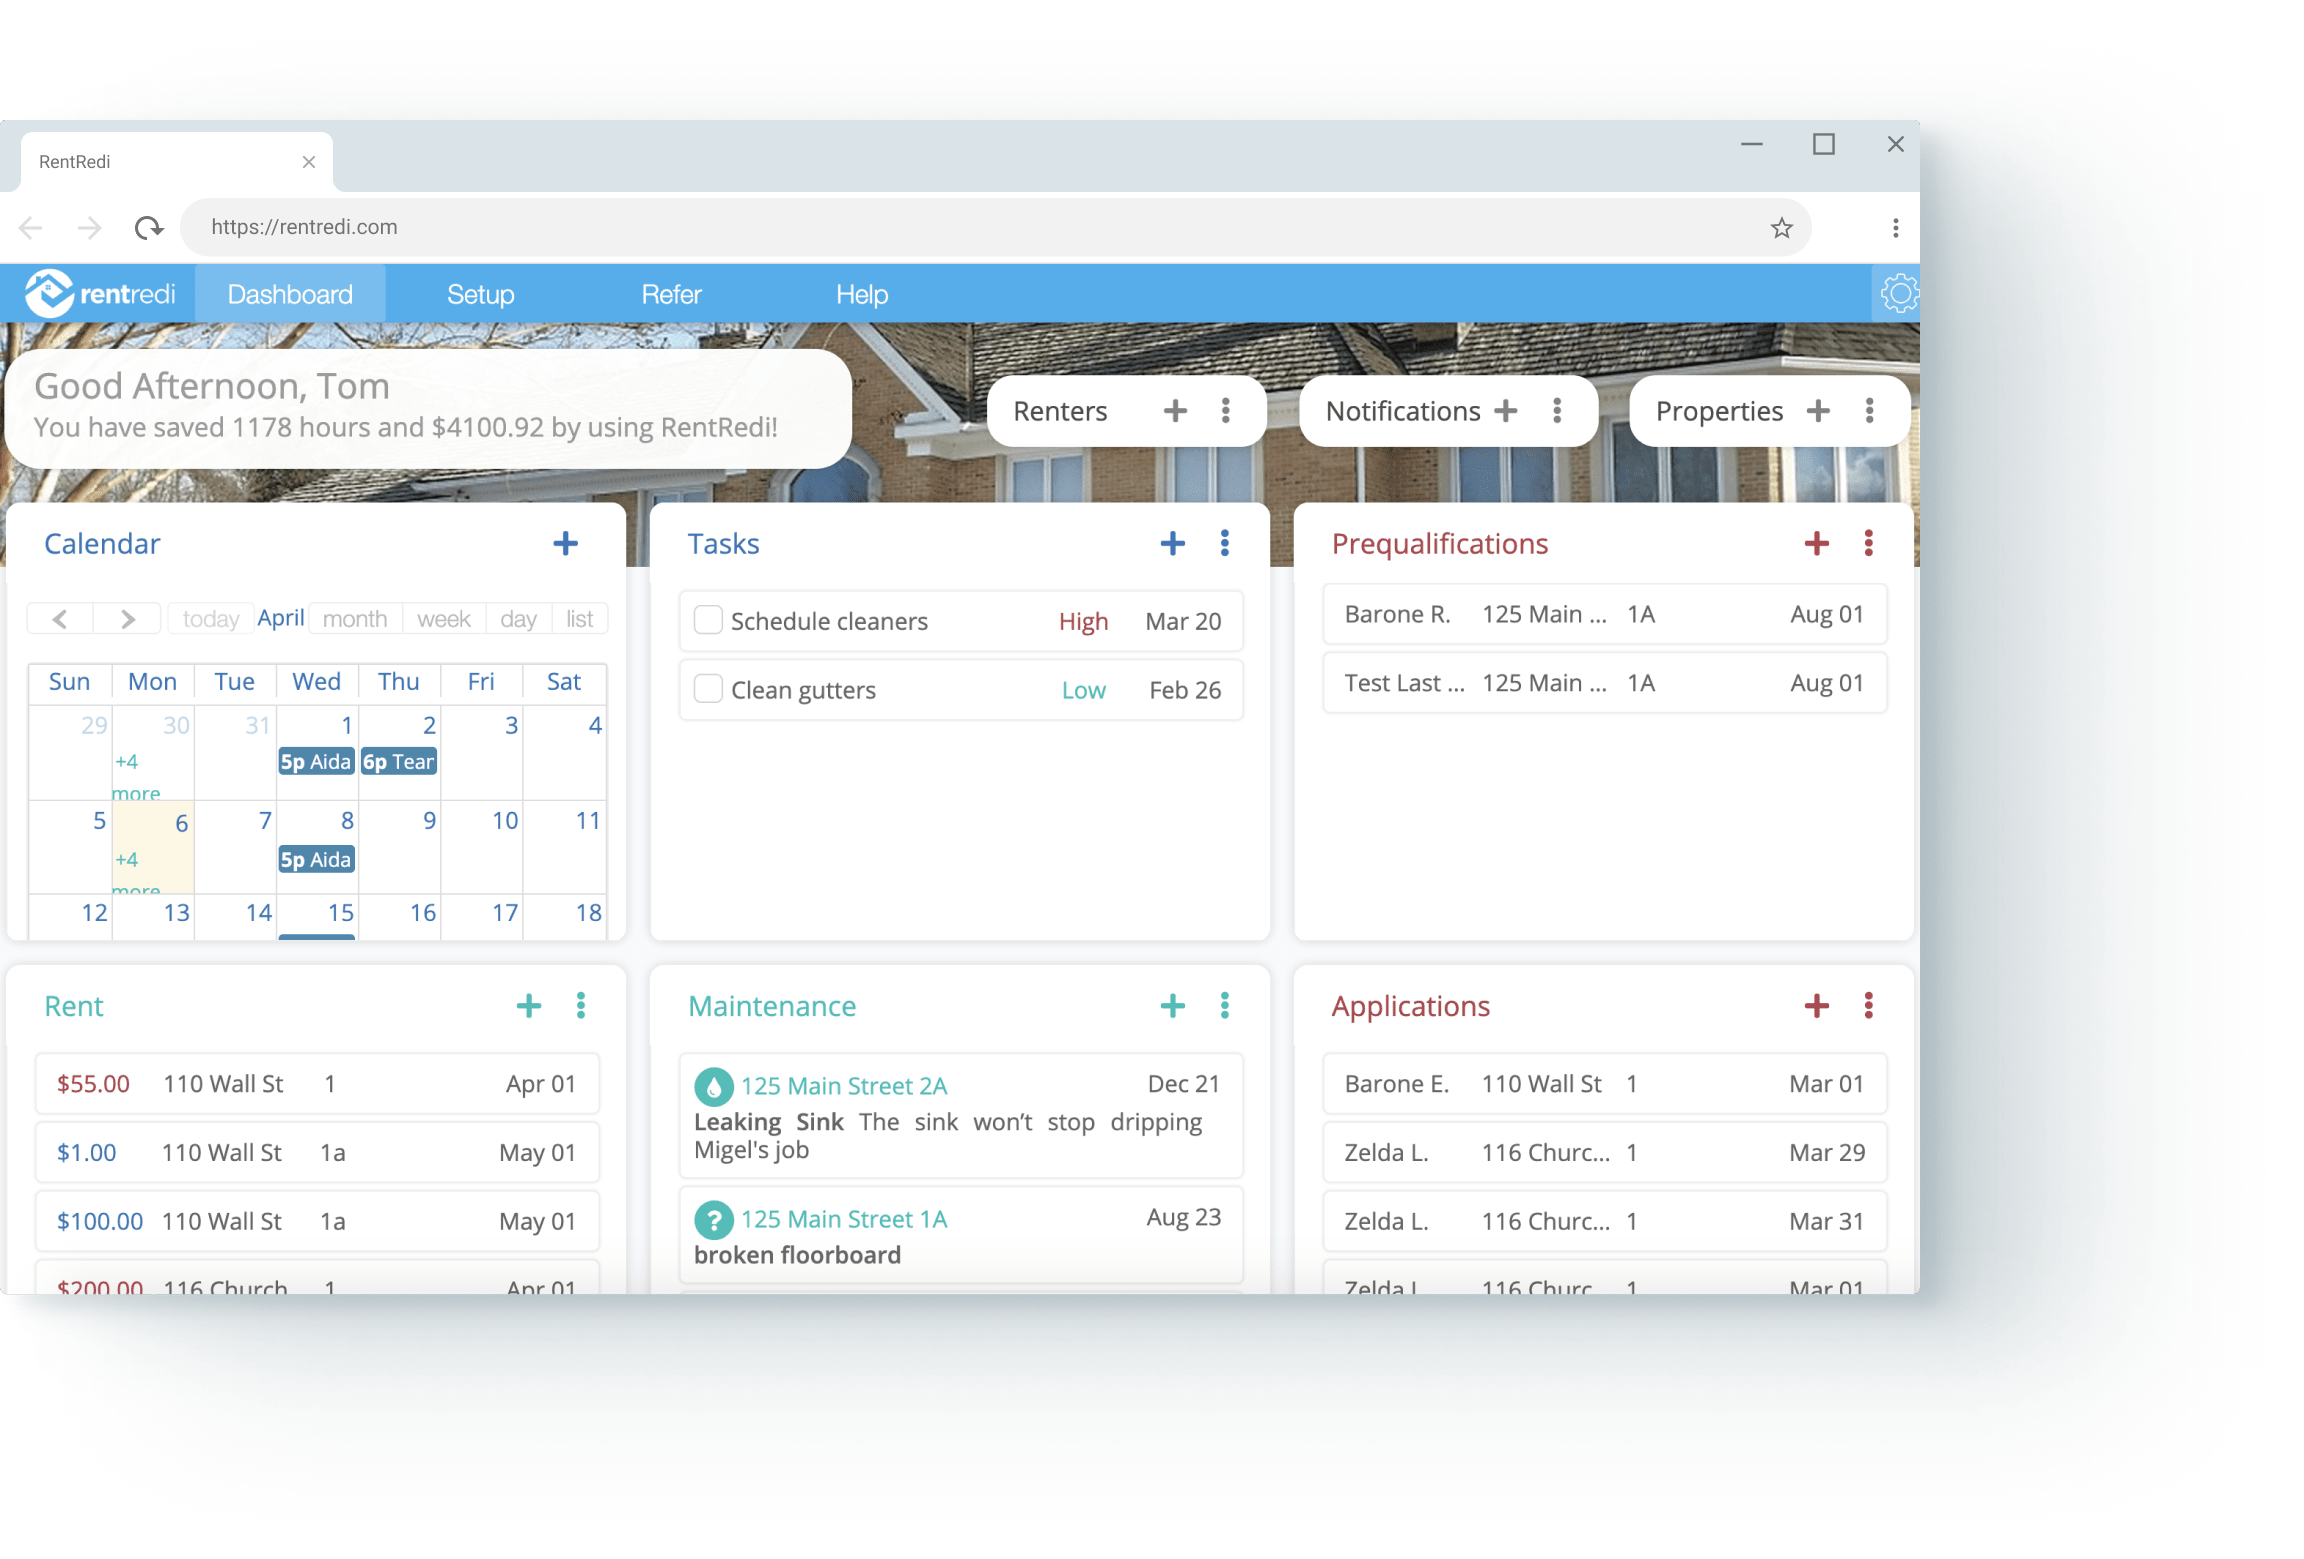 rentredi app browser view